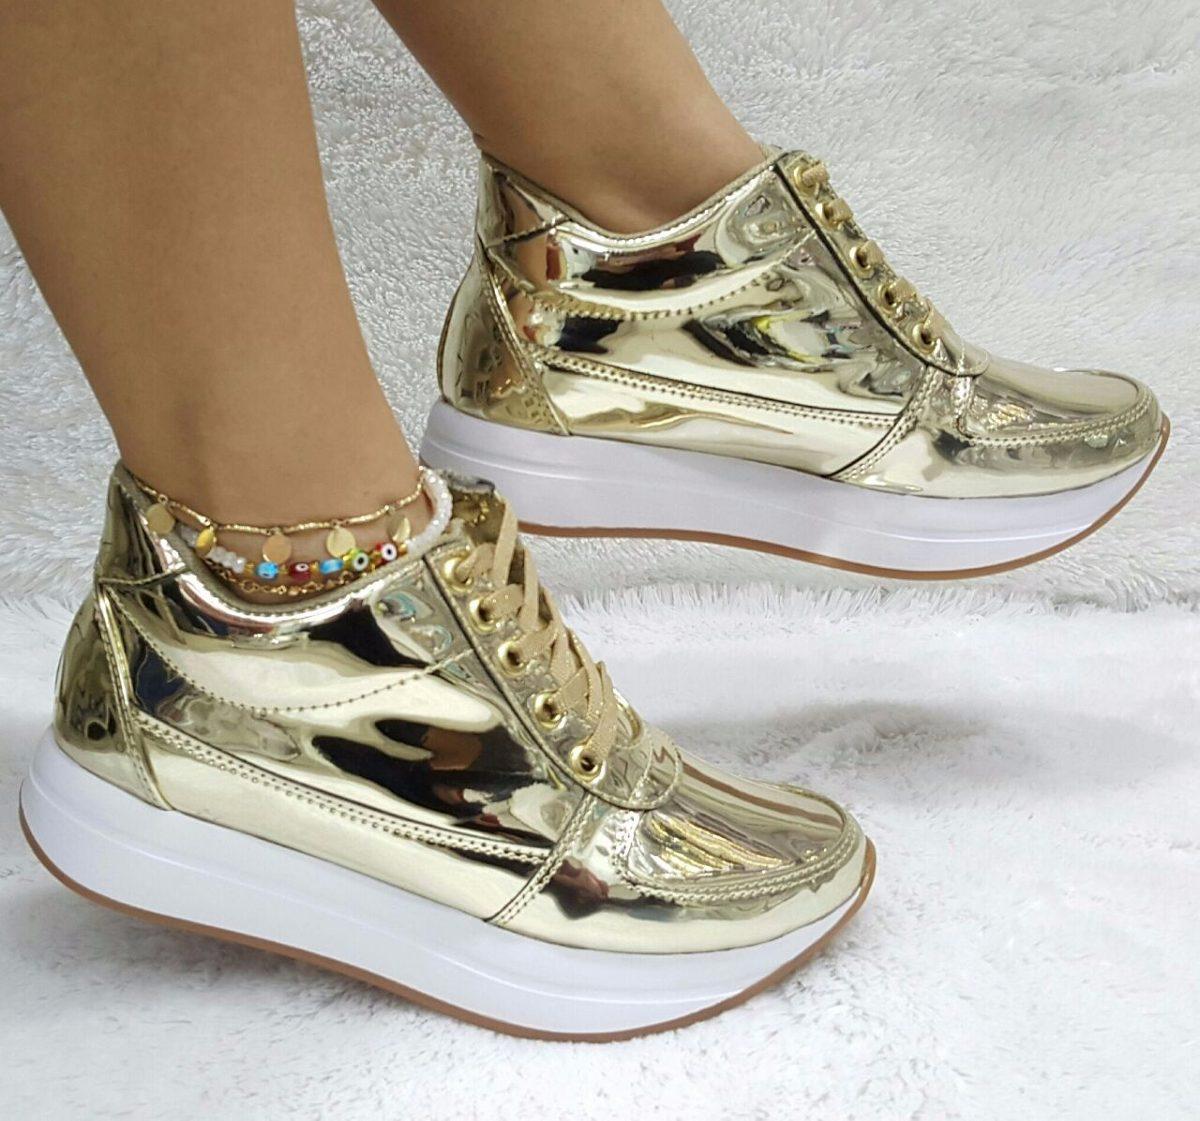 Metalizado Calzado Moda Mujer Dorado Deportivo Zapato 4O7ZI